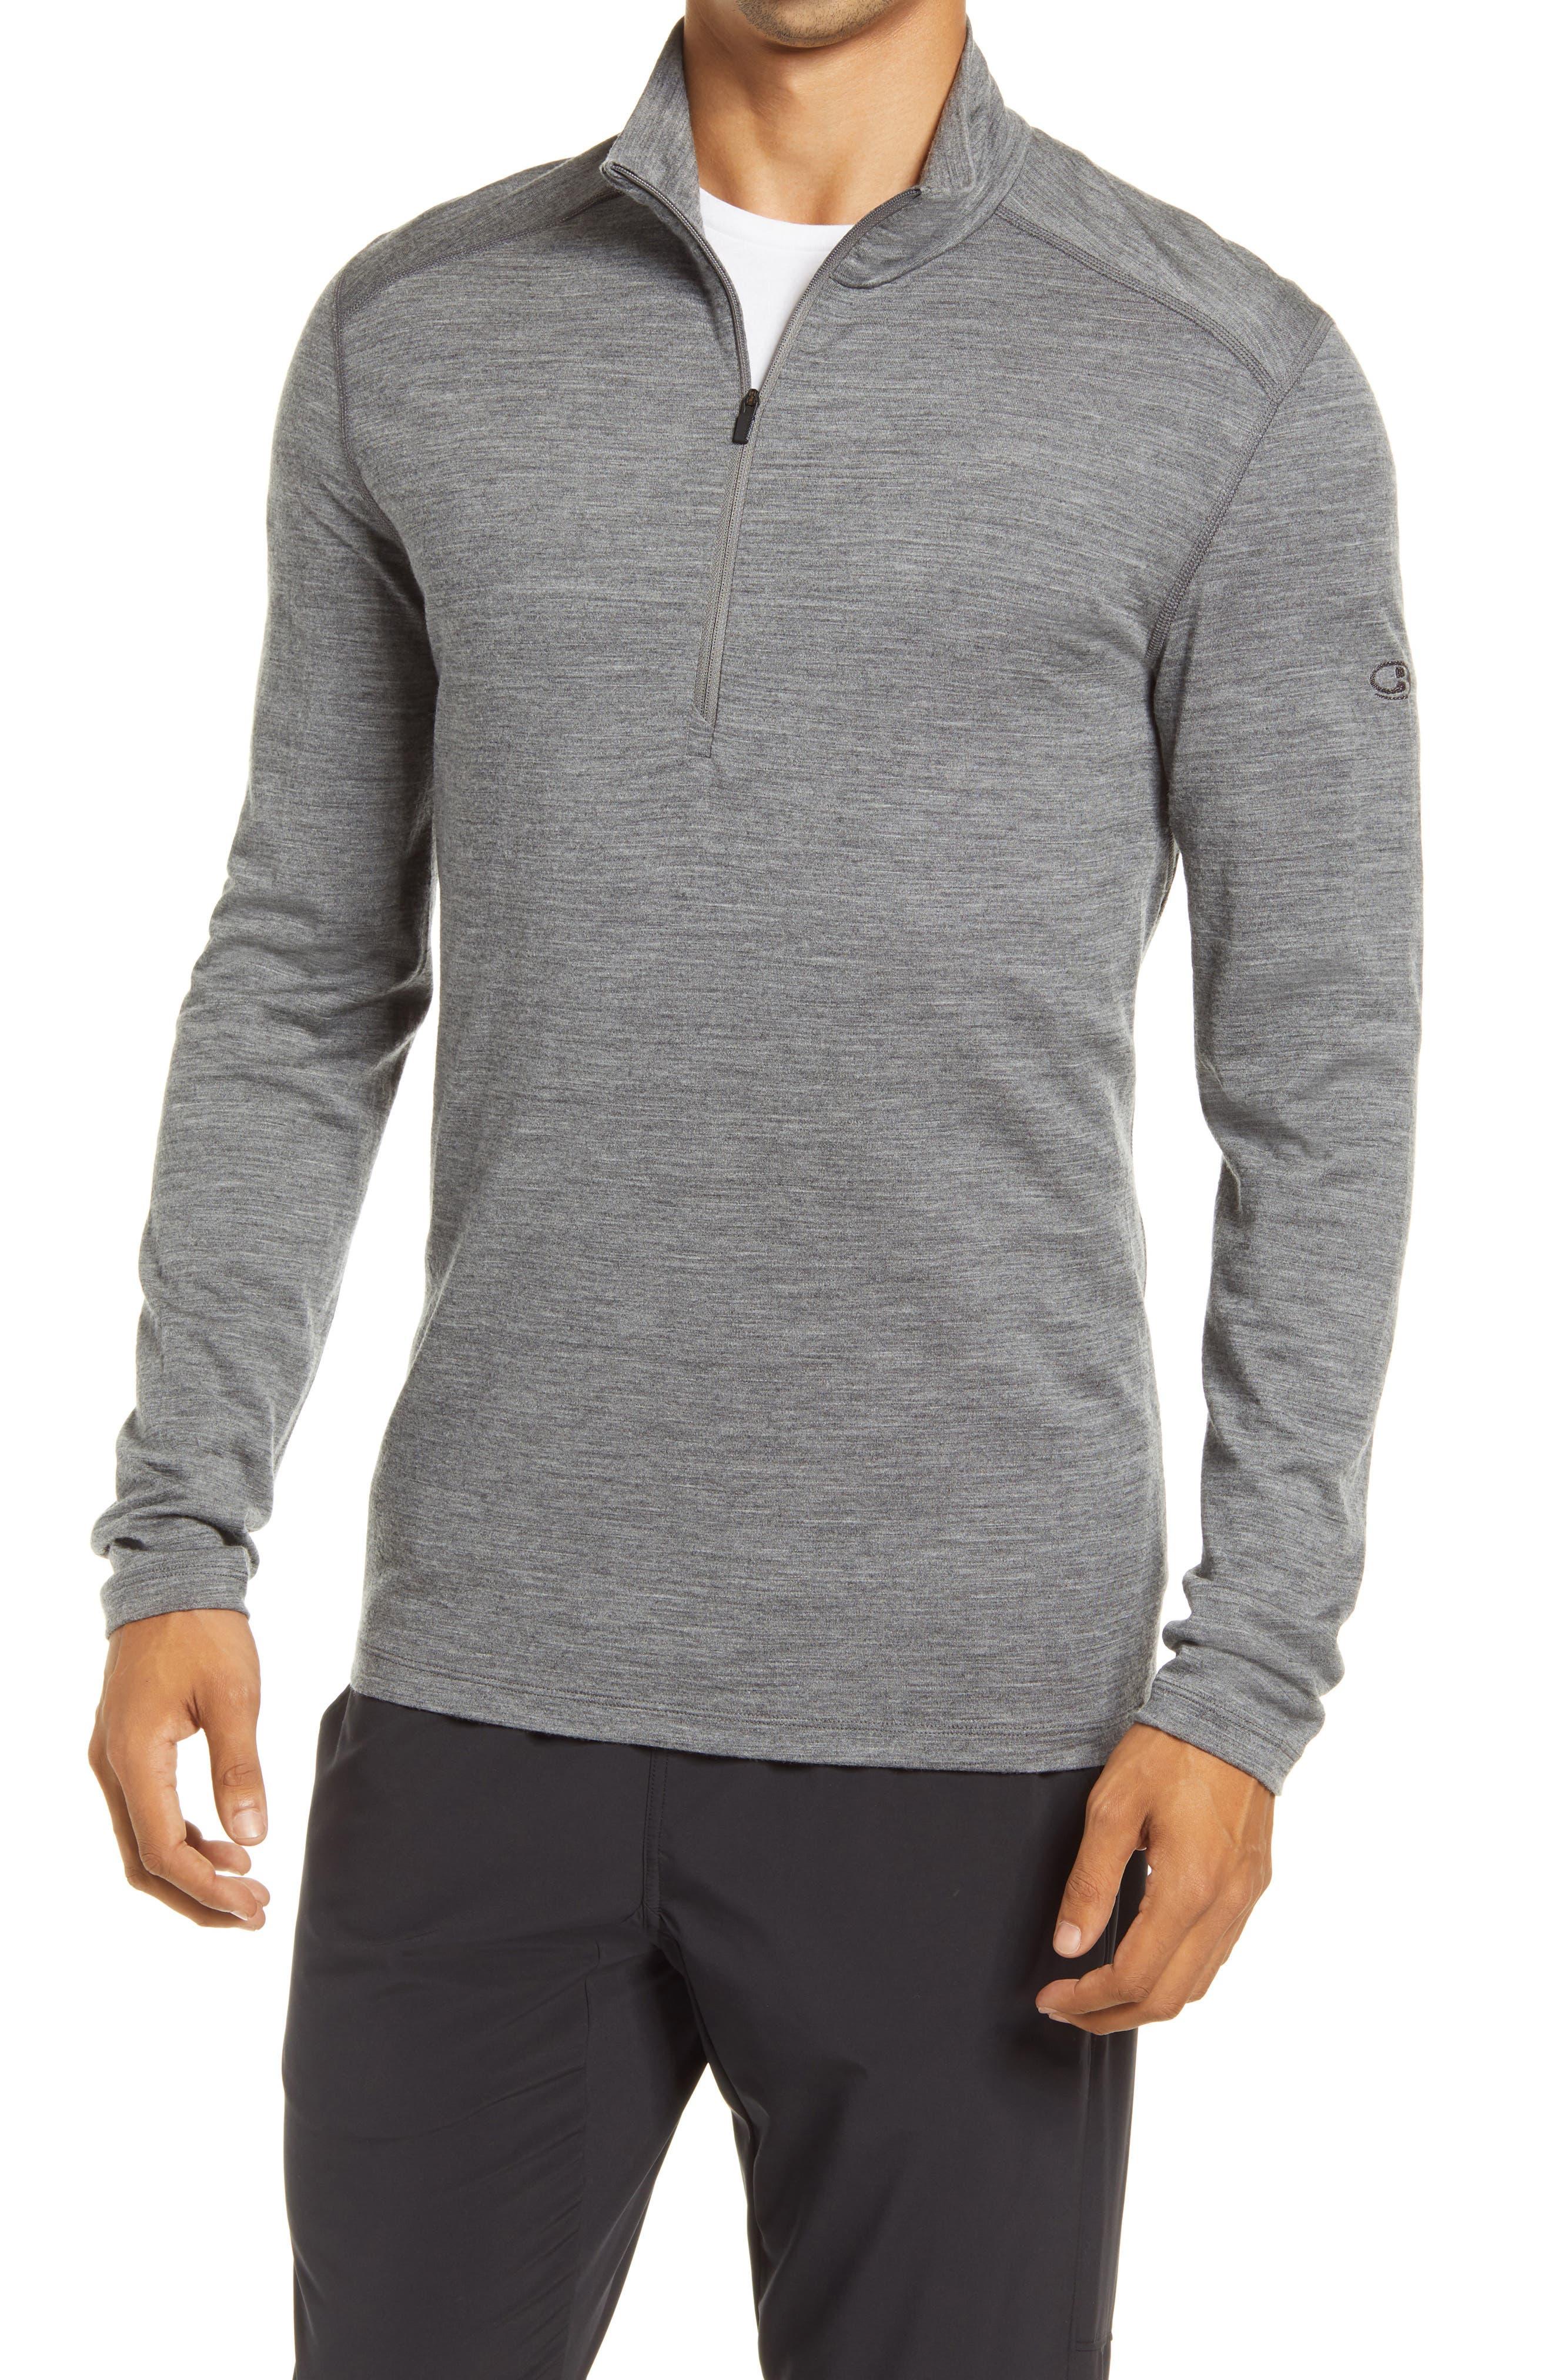 200 Oasis Merino Wool Half Zip Base Layer